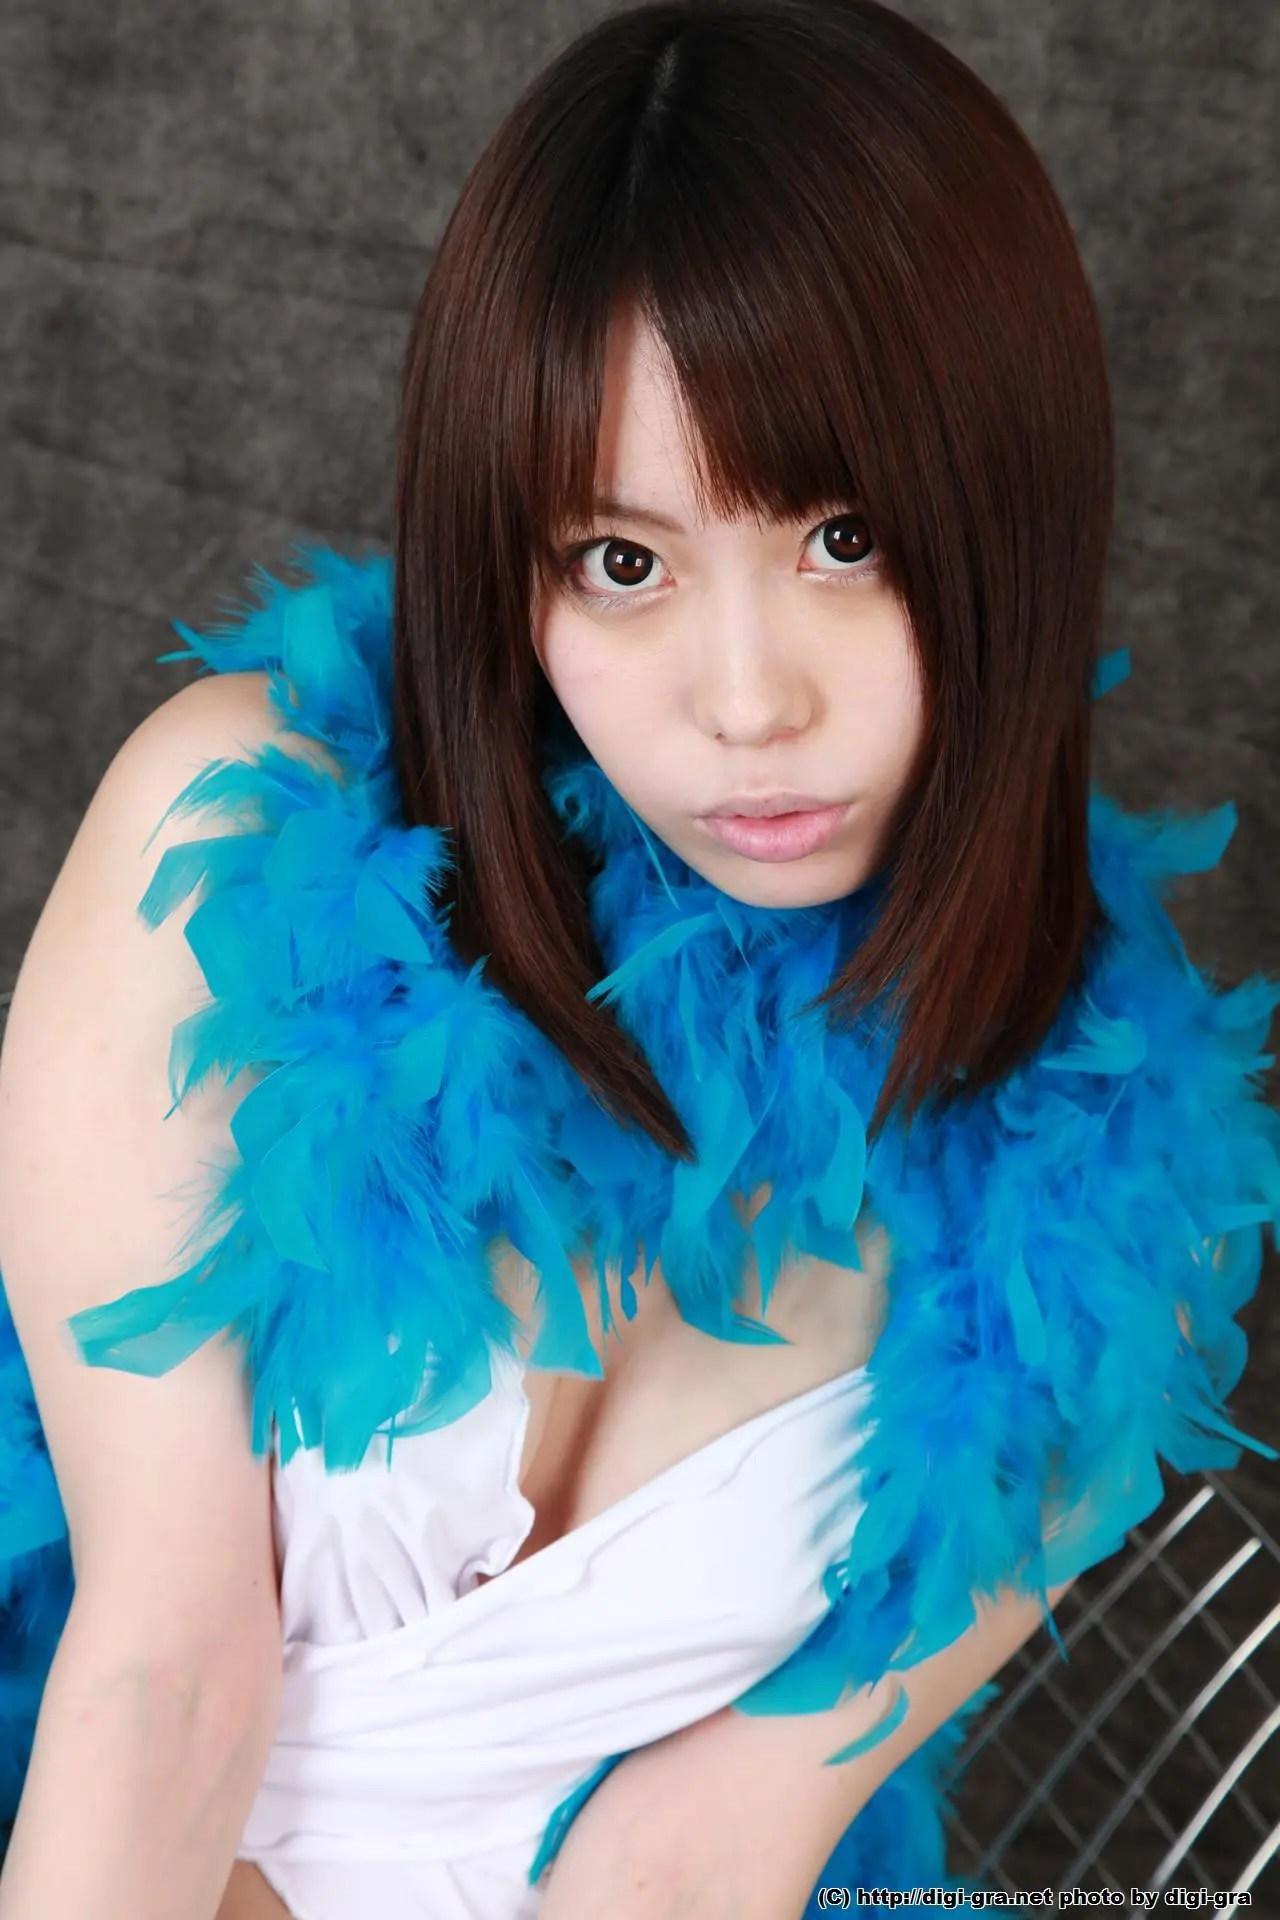 [Digi-Gra] 川菜美铃  Misuzu Kawana Photoset 05 写真集[53P]插图(10)